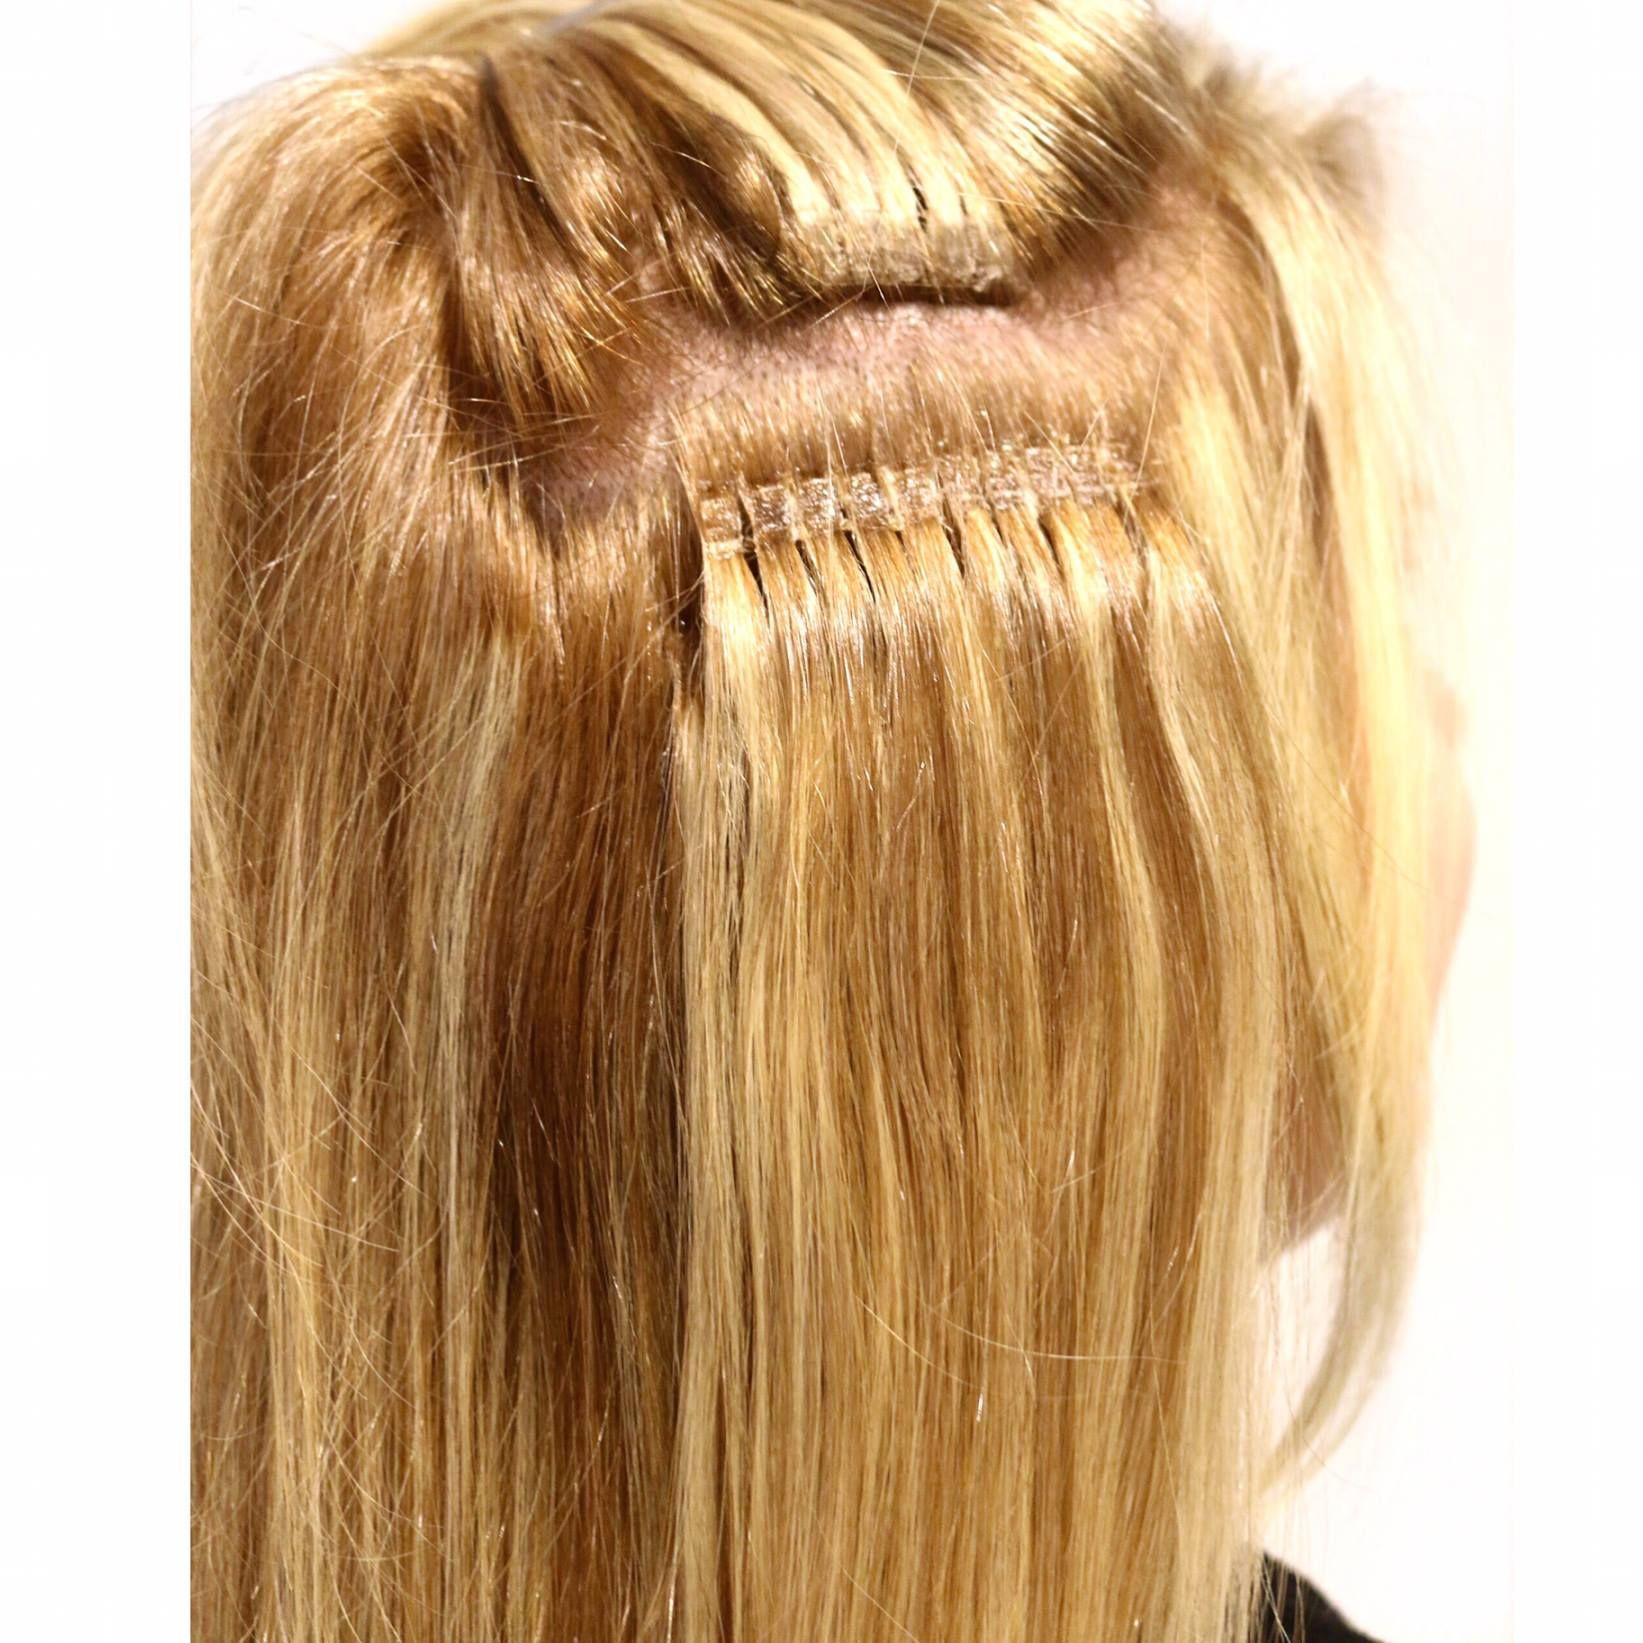 Haarverlangerung laserbeamer